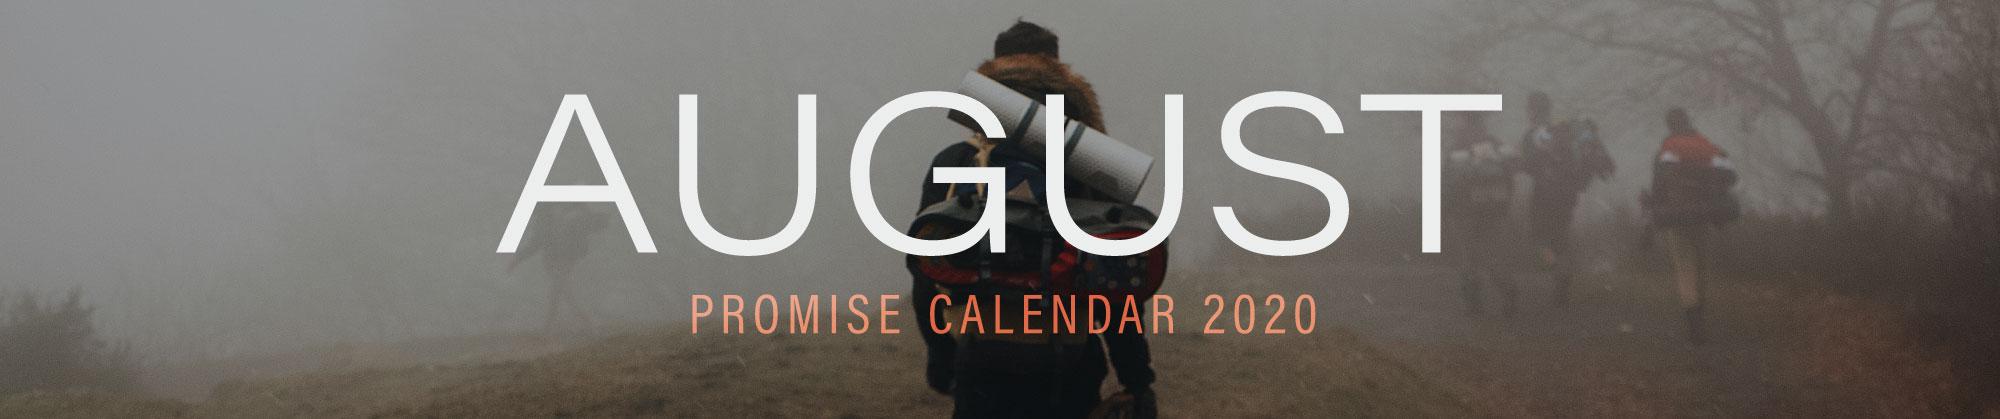 August 2020 Promise Calendar Header